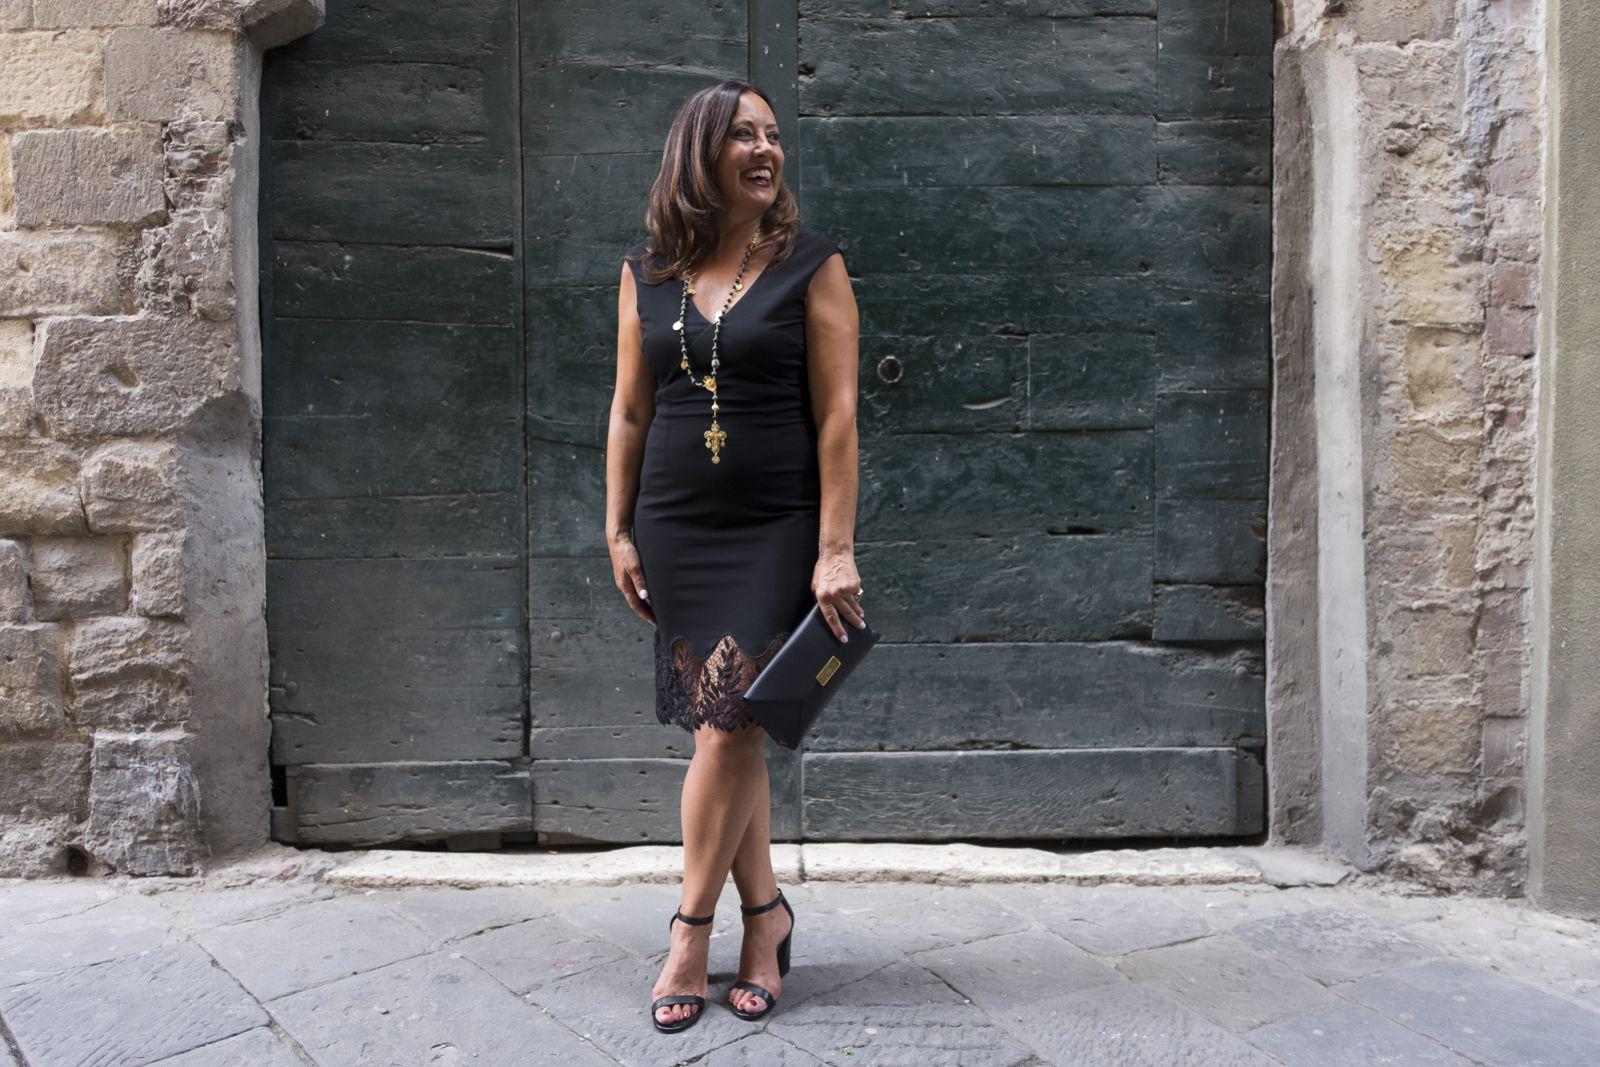 Little black dress Not Only twenty